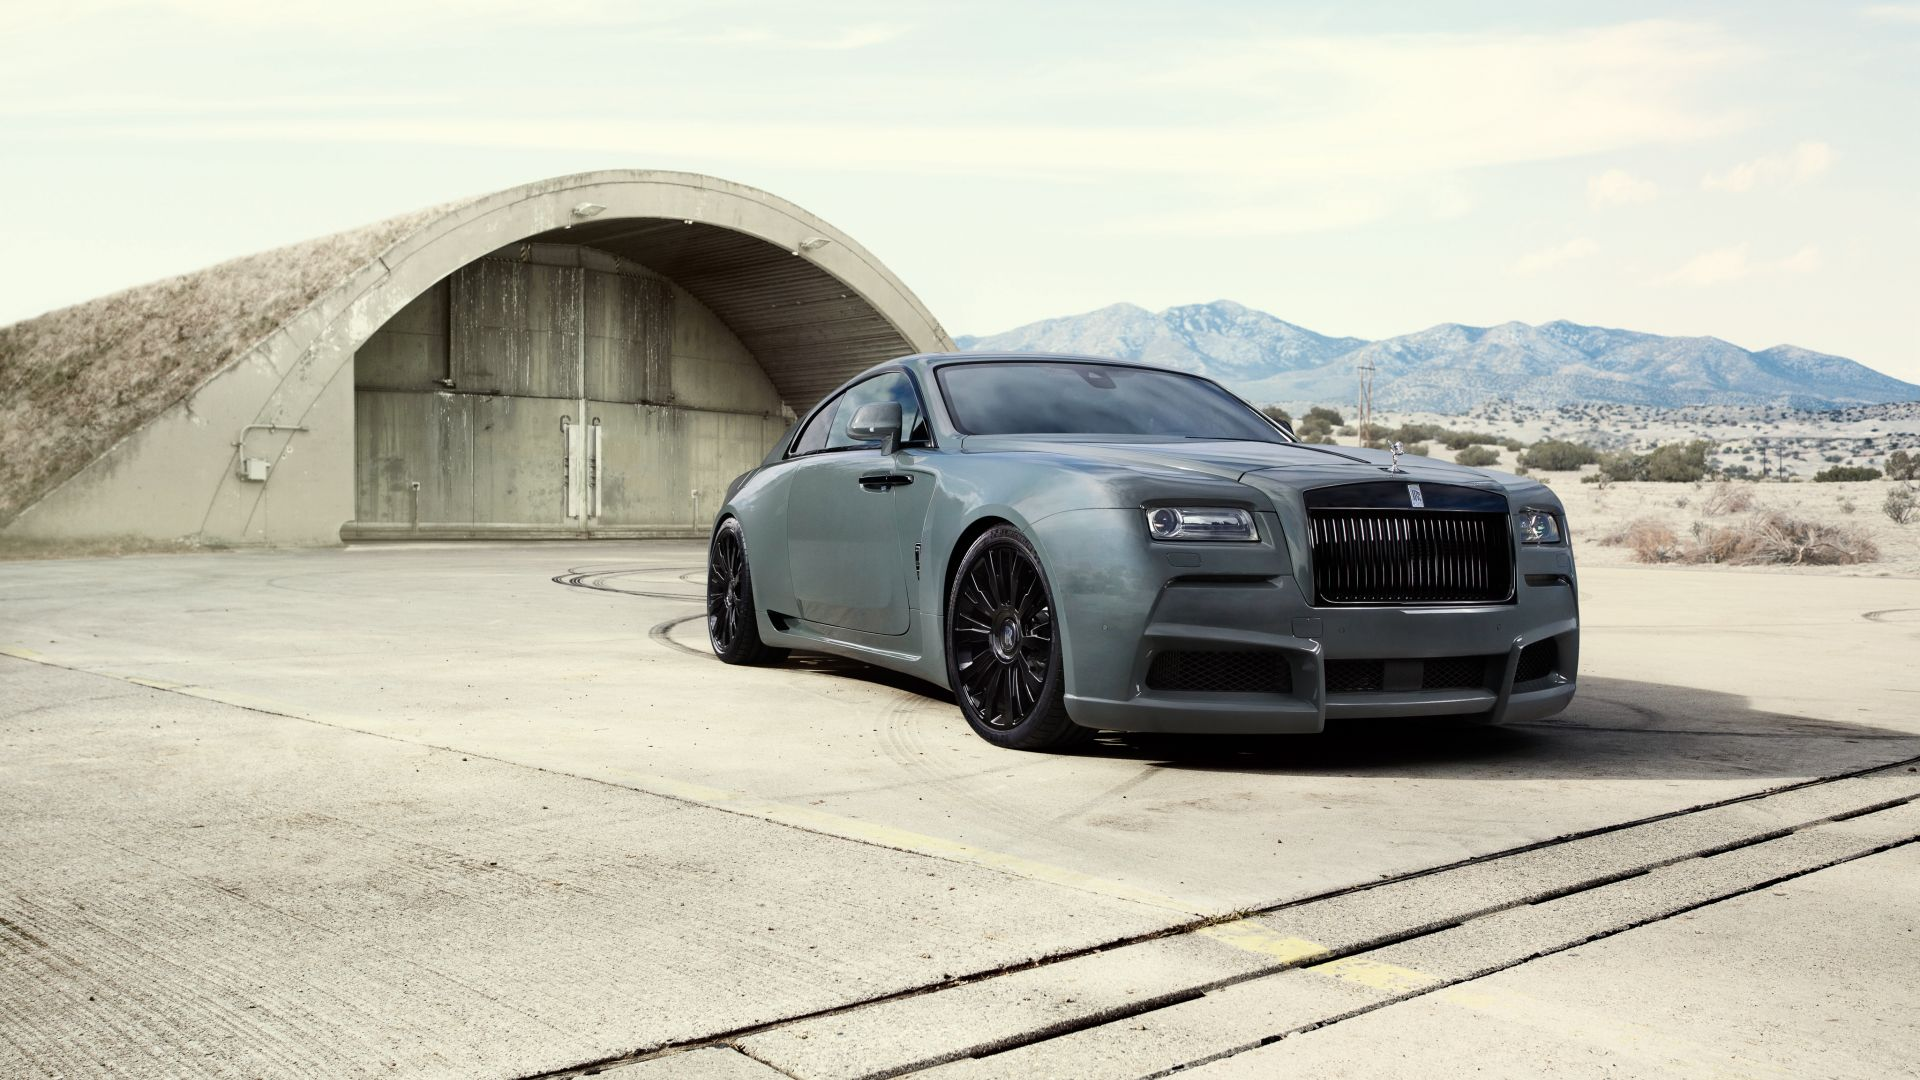 Wallpaper Luxury car, Rolls-Royce wraith car, side view